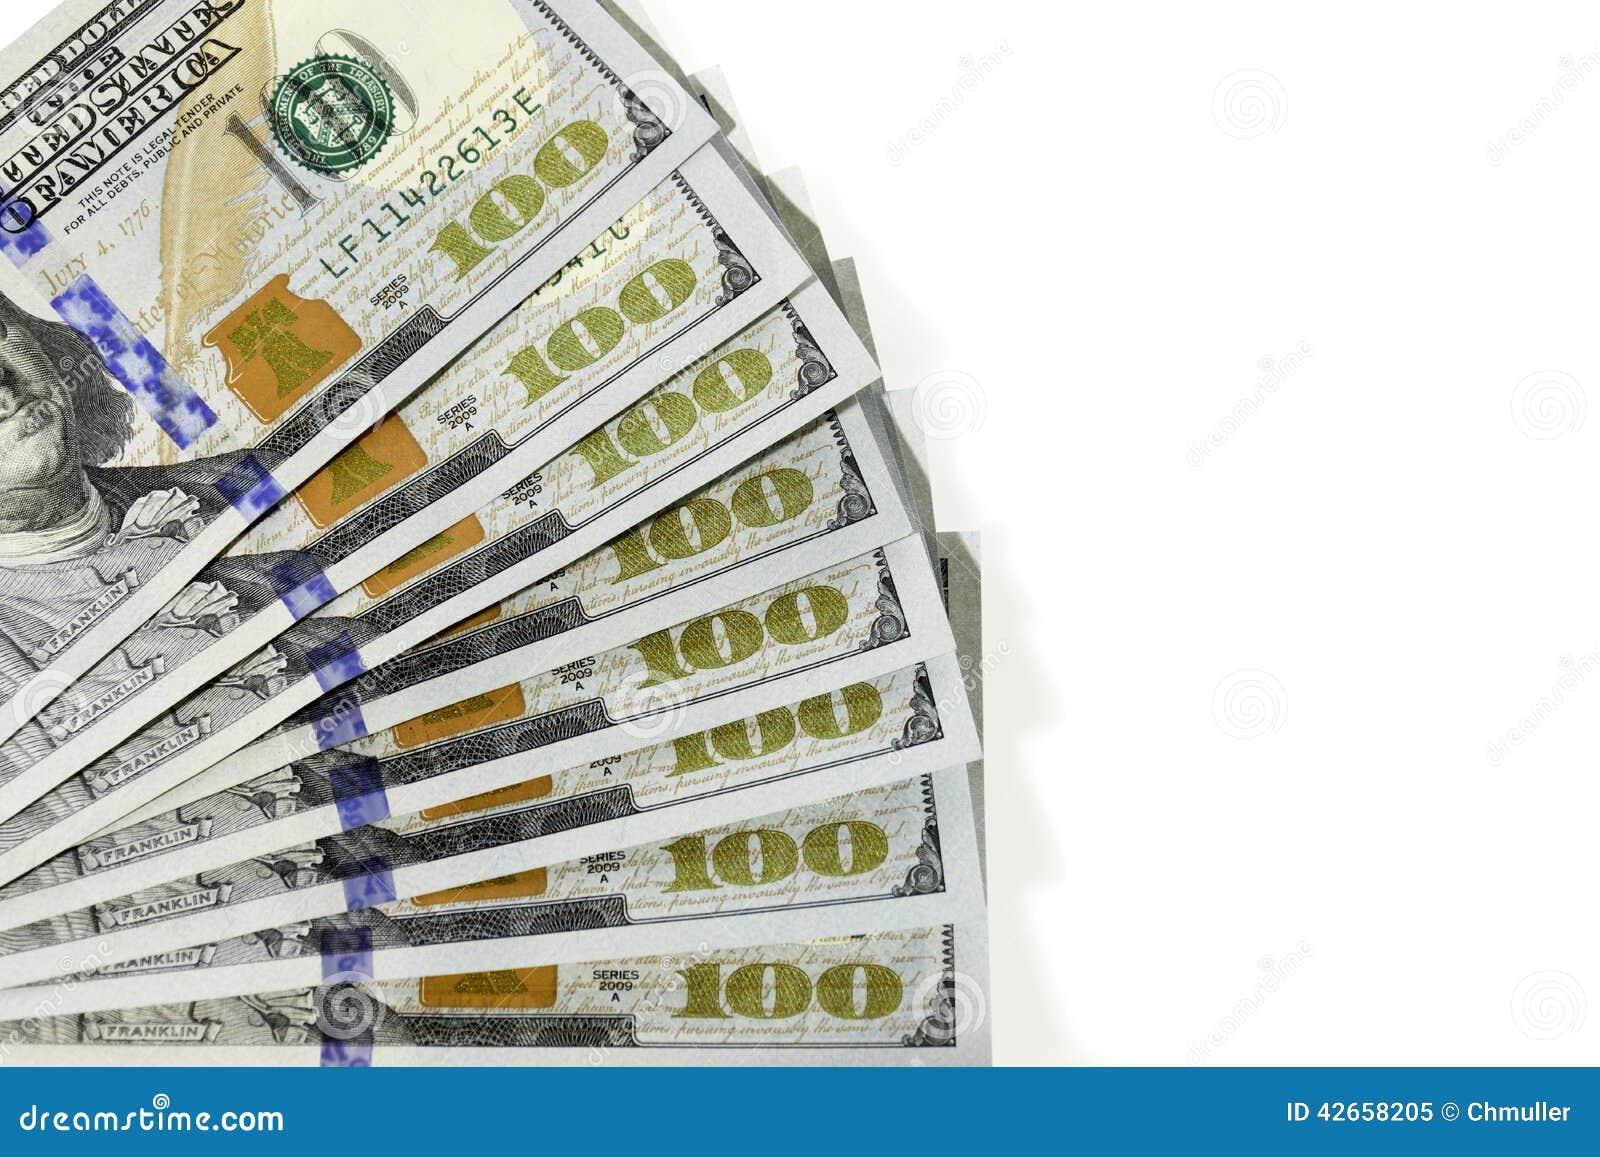 Fanned Out Hundred Dollars Bills Stock Illustration - Illustration ...